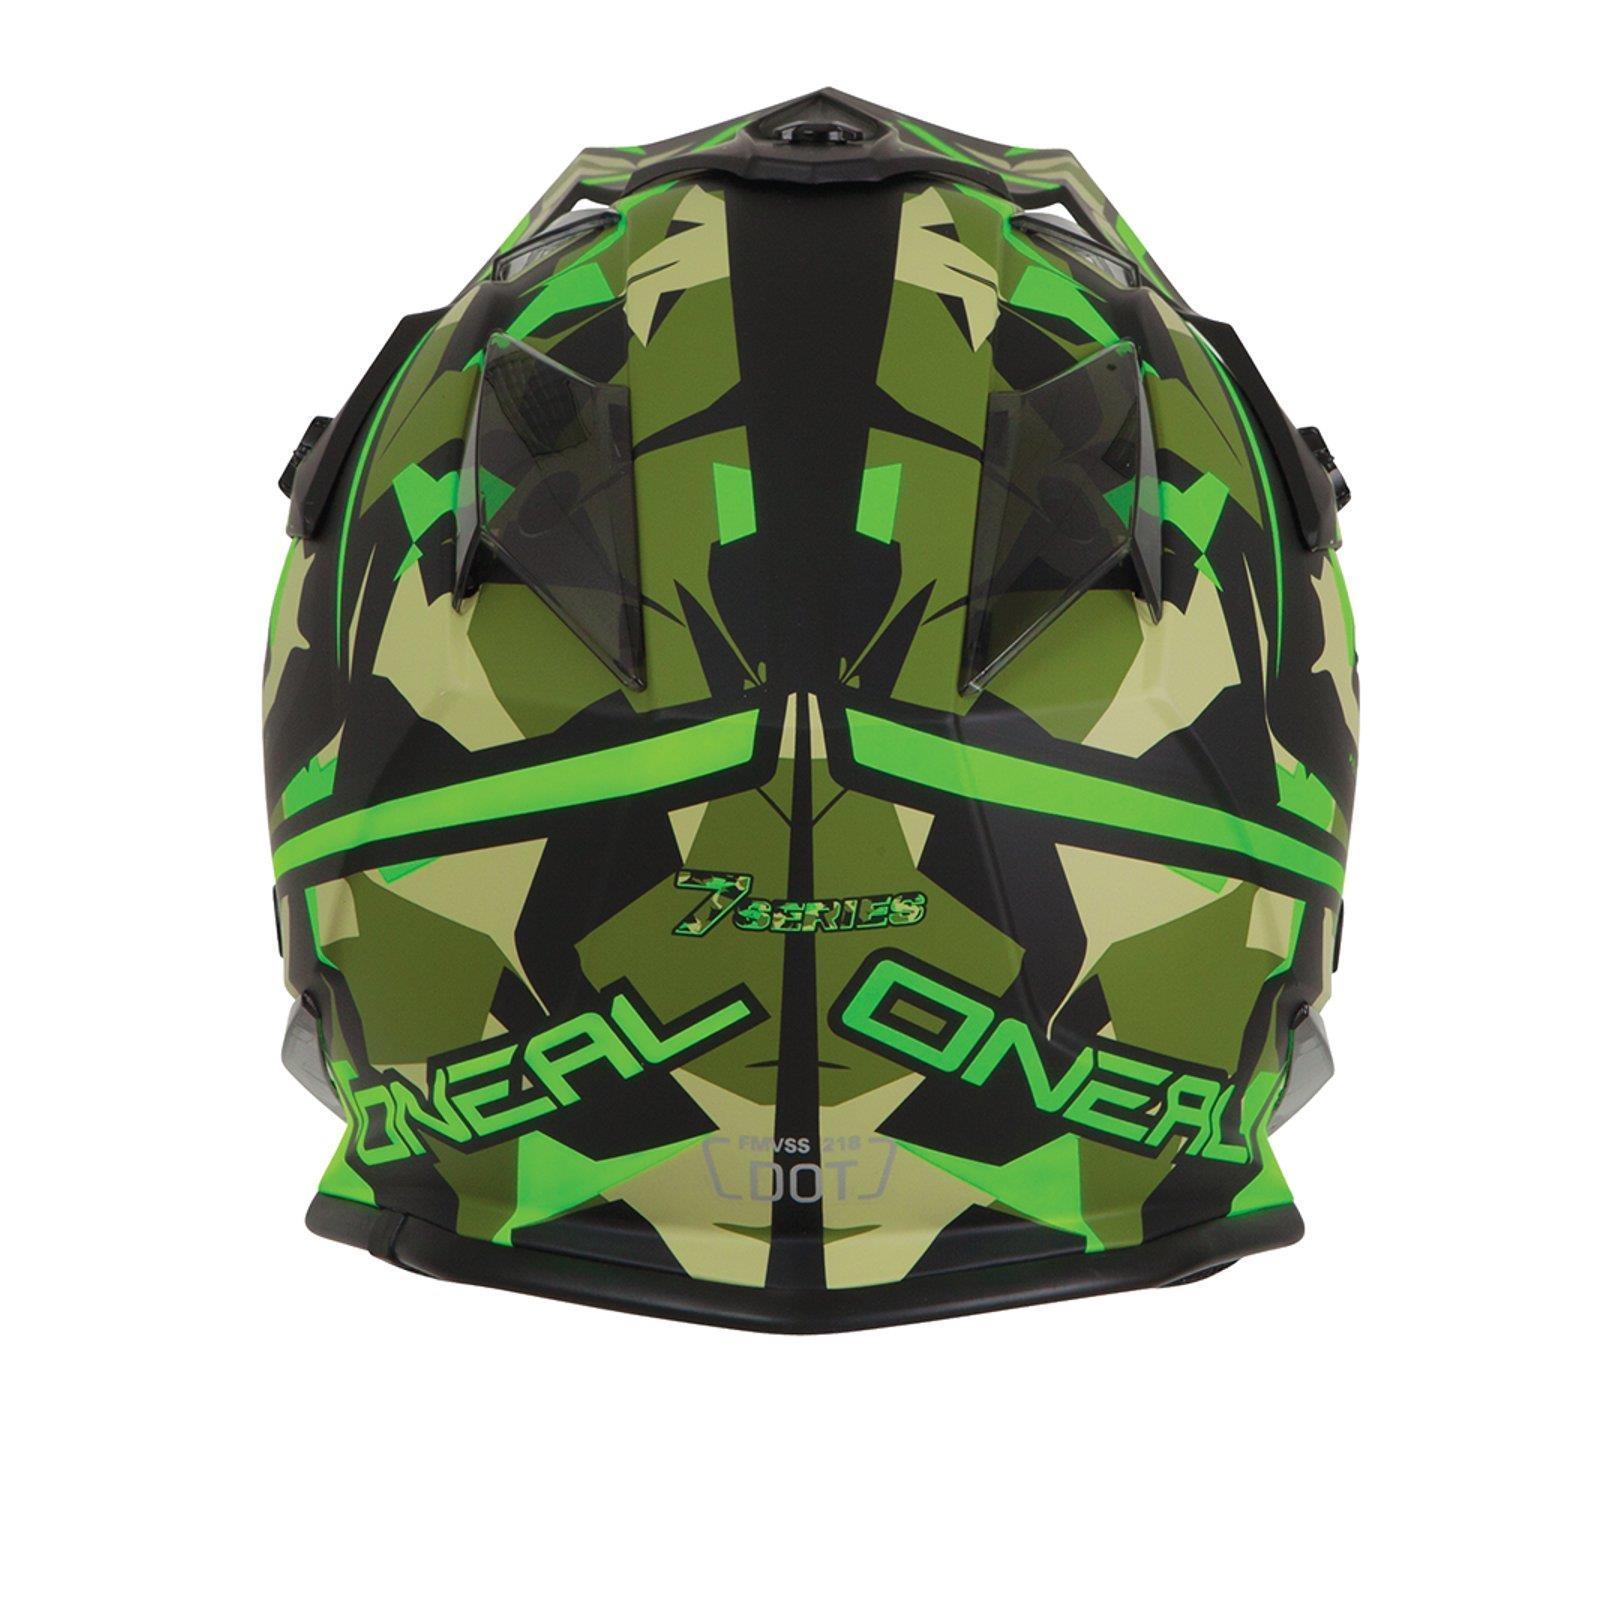 ONeal-Motocross-casco-MX-ENDURO-MOTO-BICI-FUORISTRADA-CROSS-Series-Adventure miniatura 125